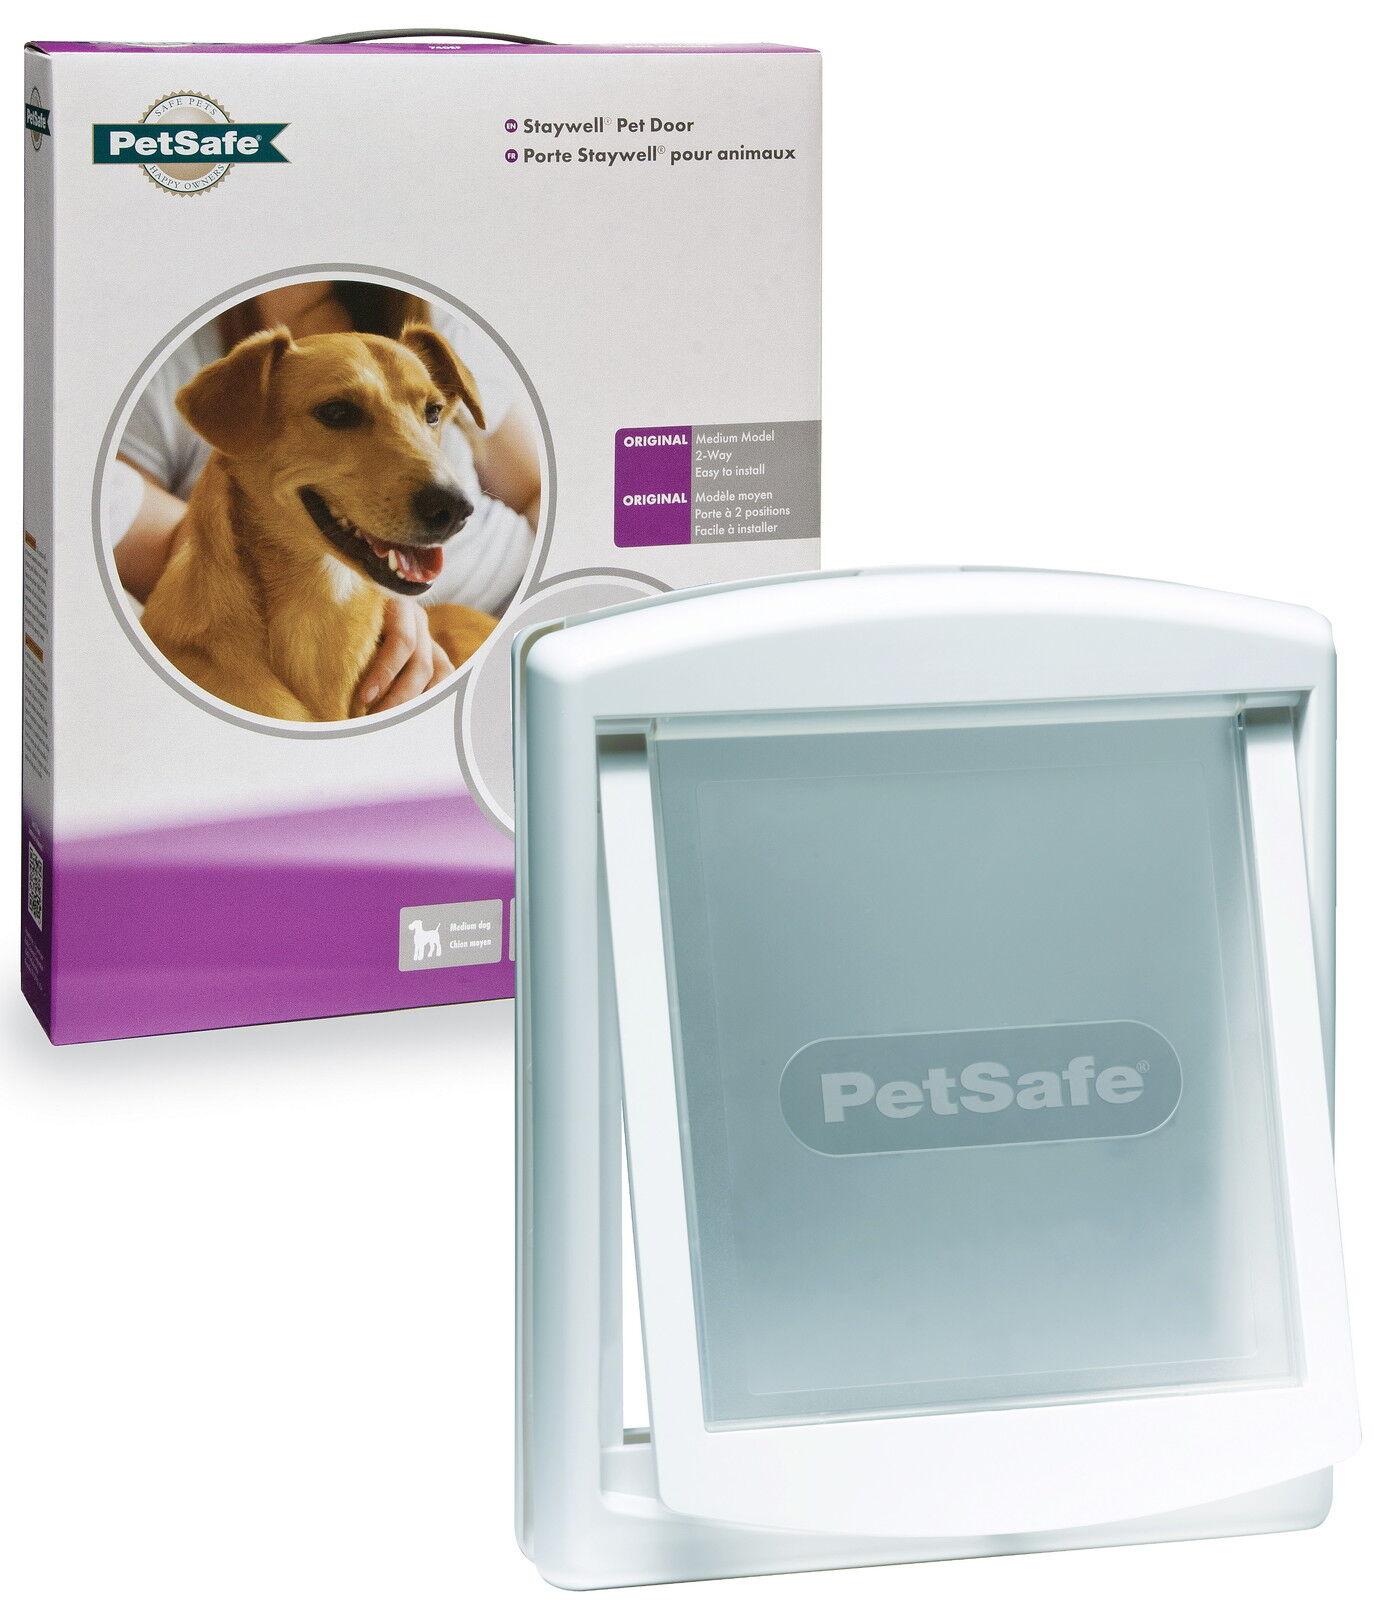 Staywell Petsafe 740 Medium Dog Flap Pet Door White 2 Way Locking